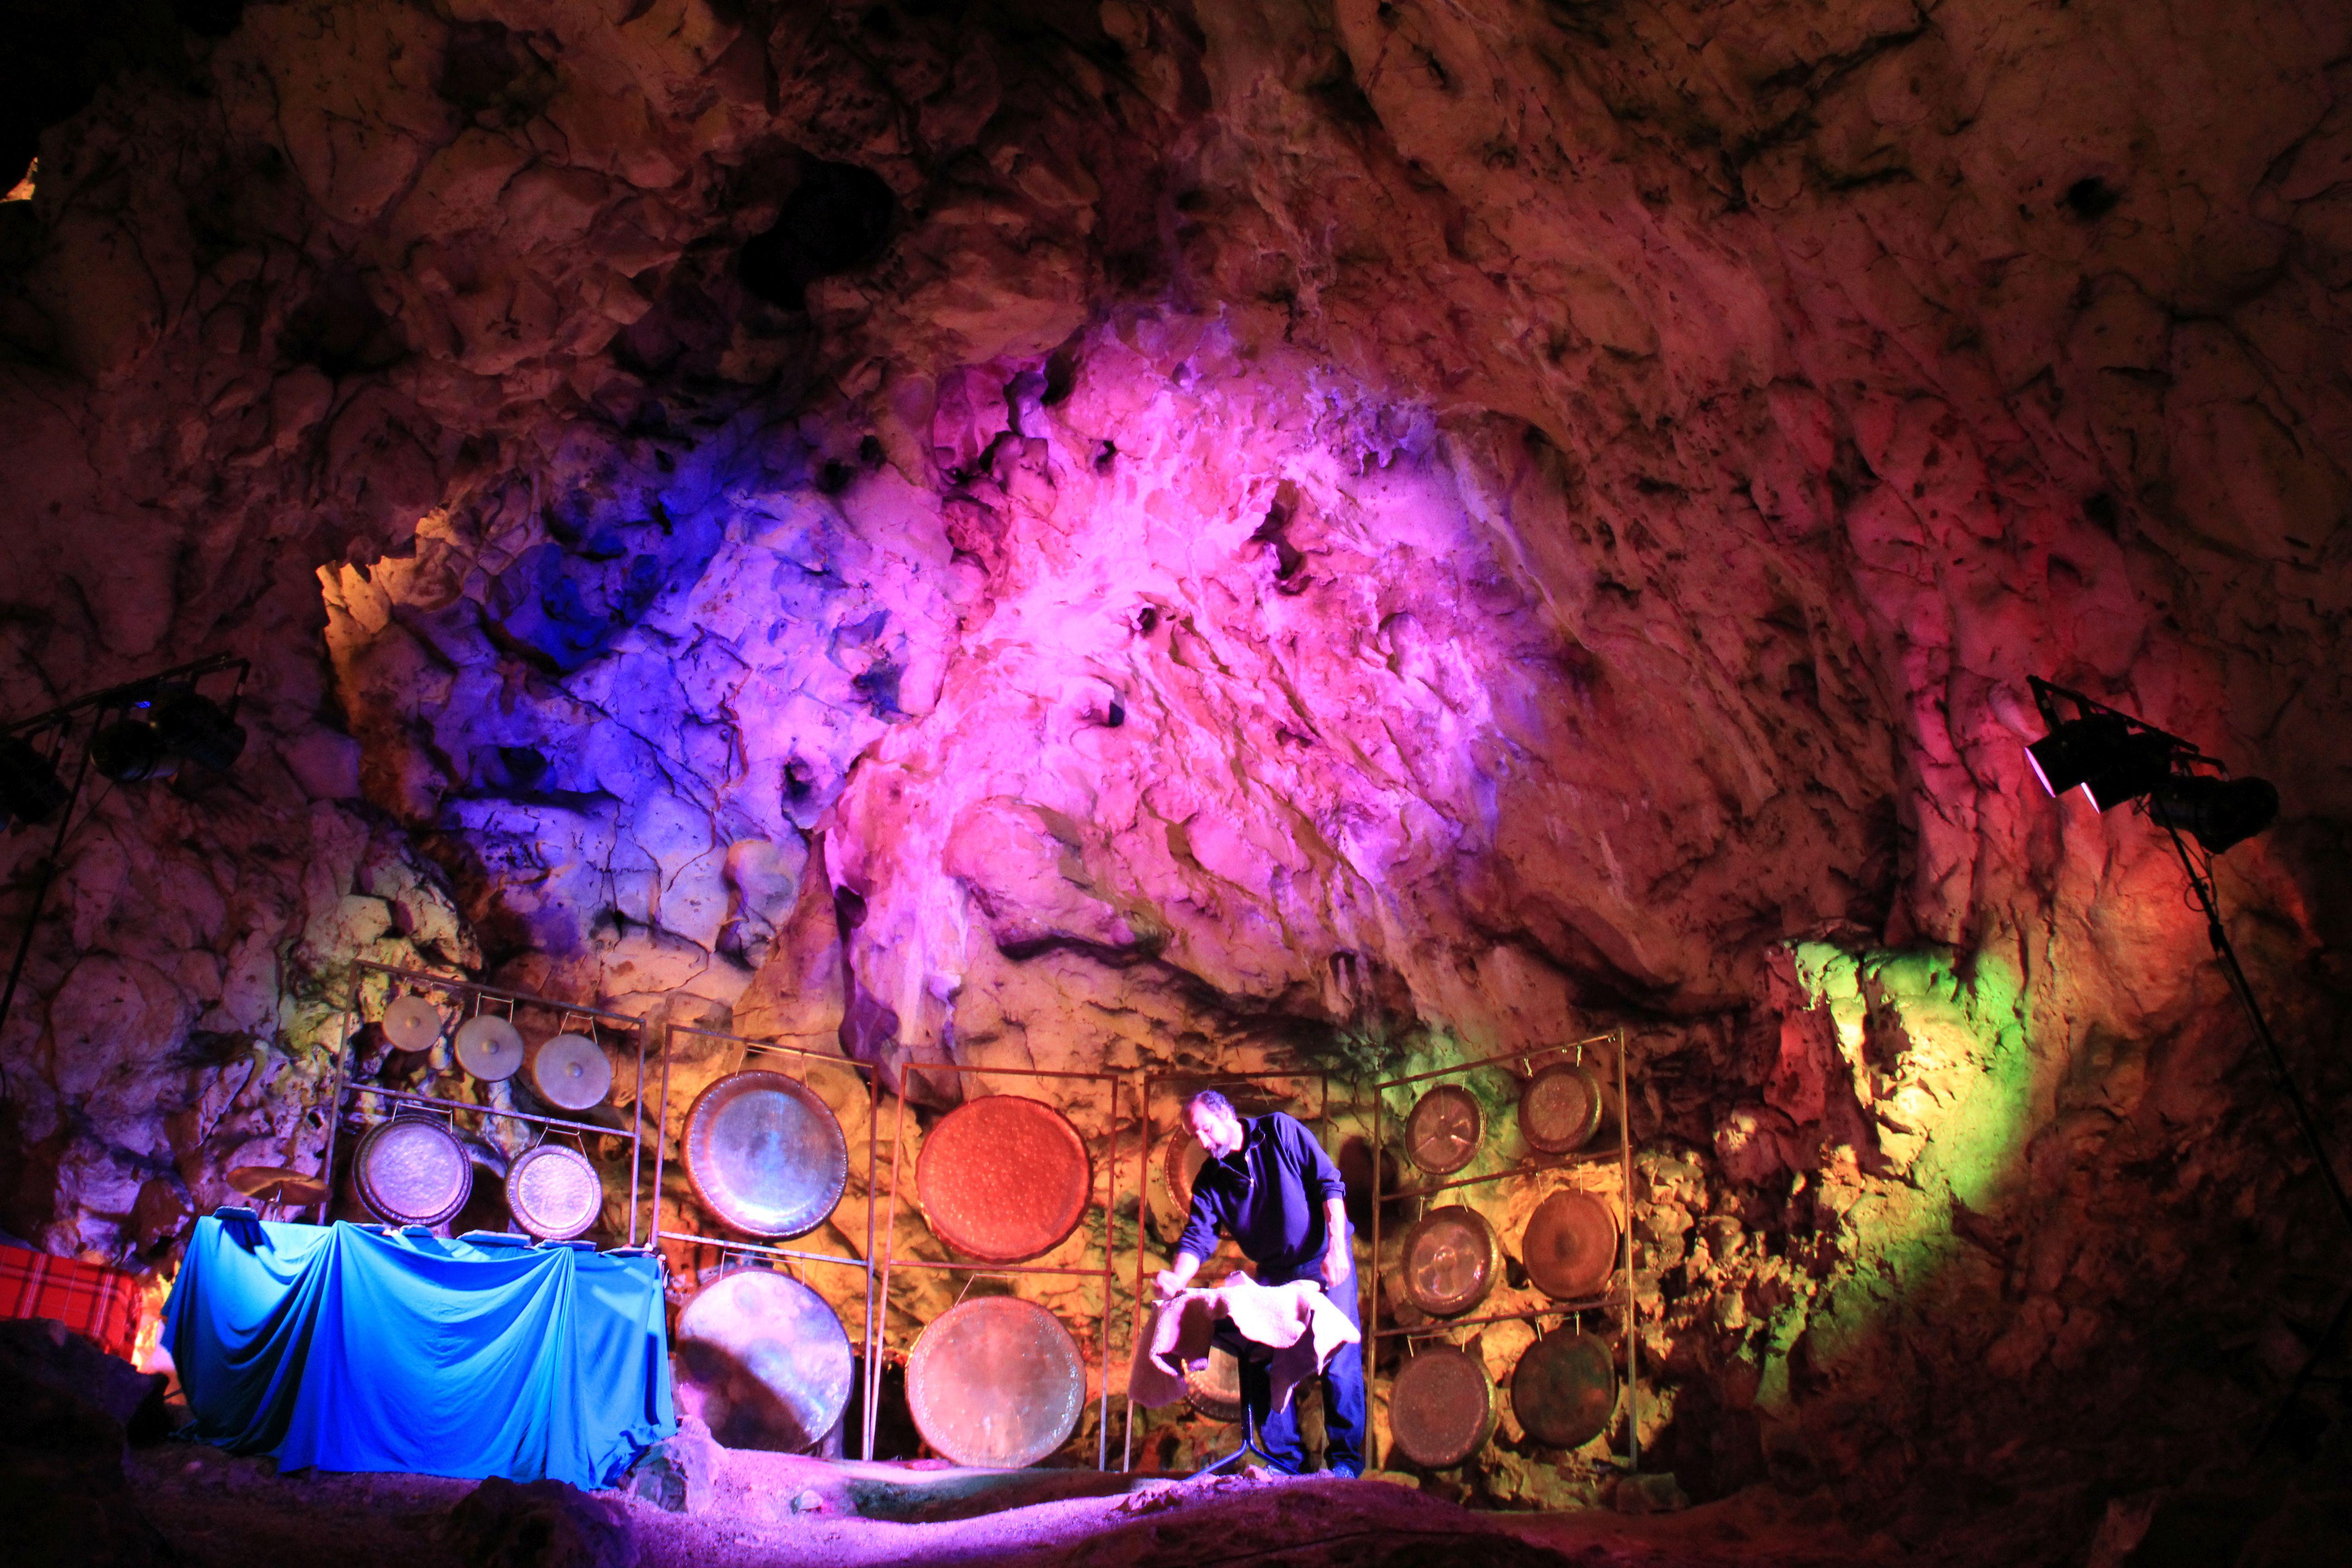 höhlen ag tübingen